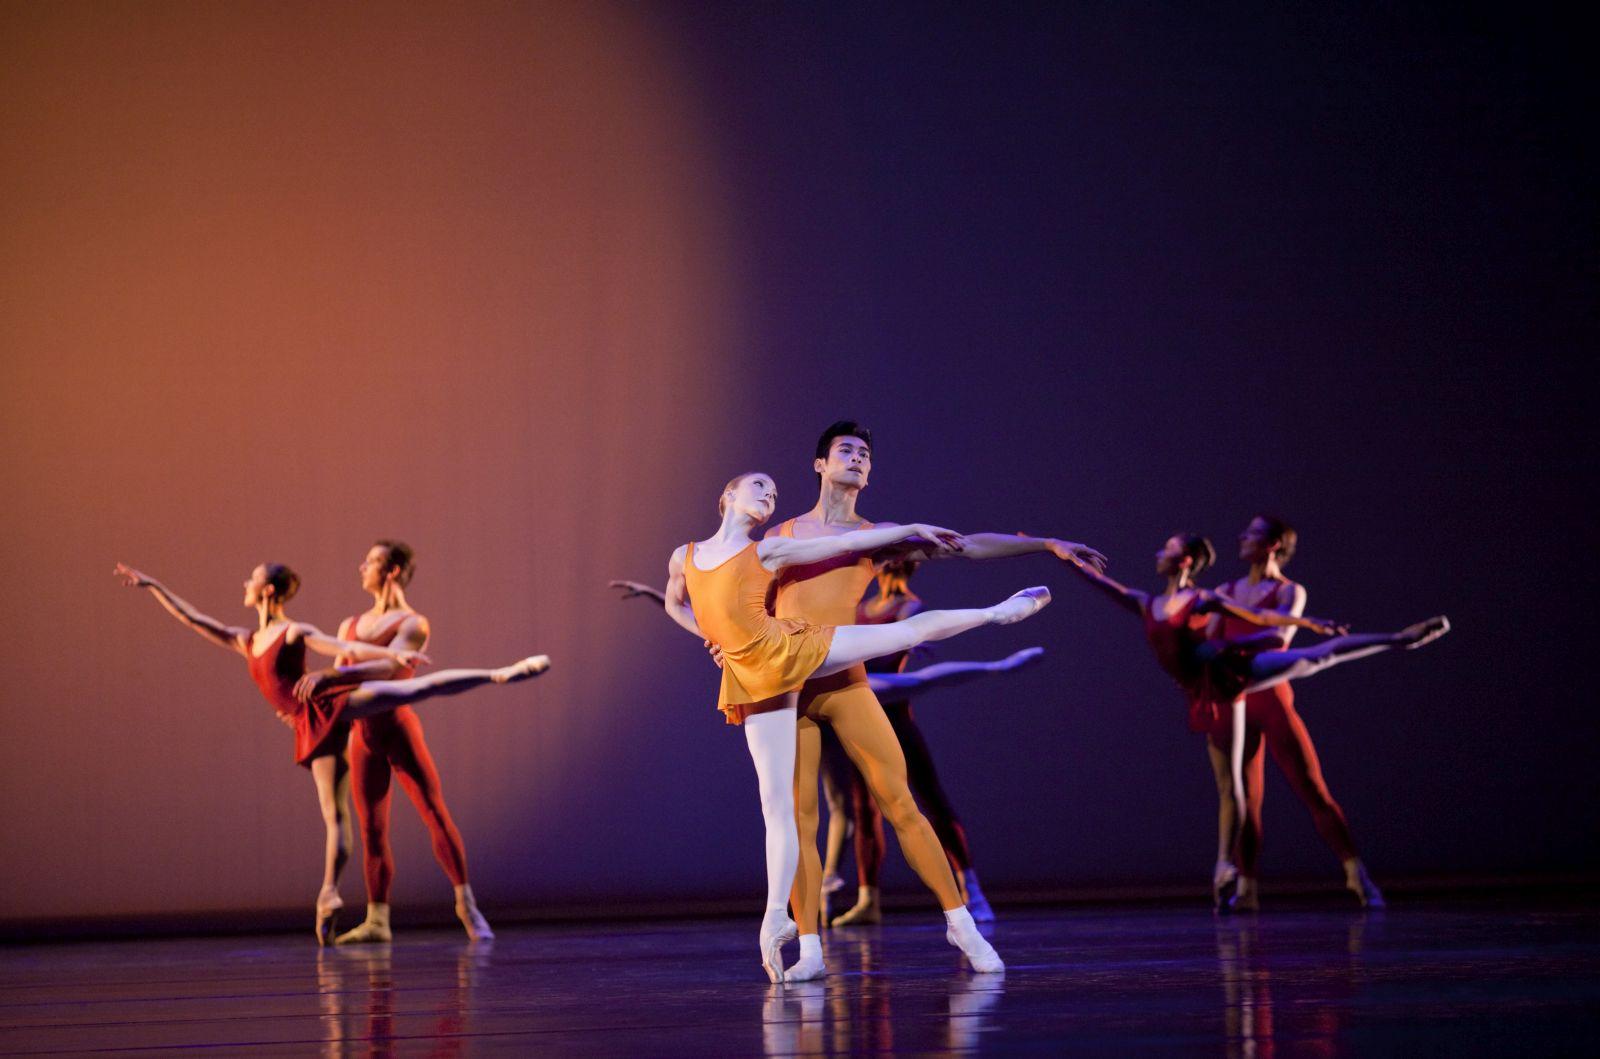 Concerto by MacMillan , choreography - Kenneth MacMillan,